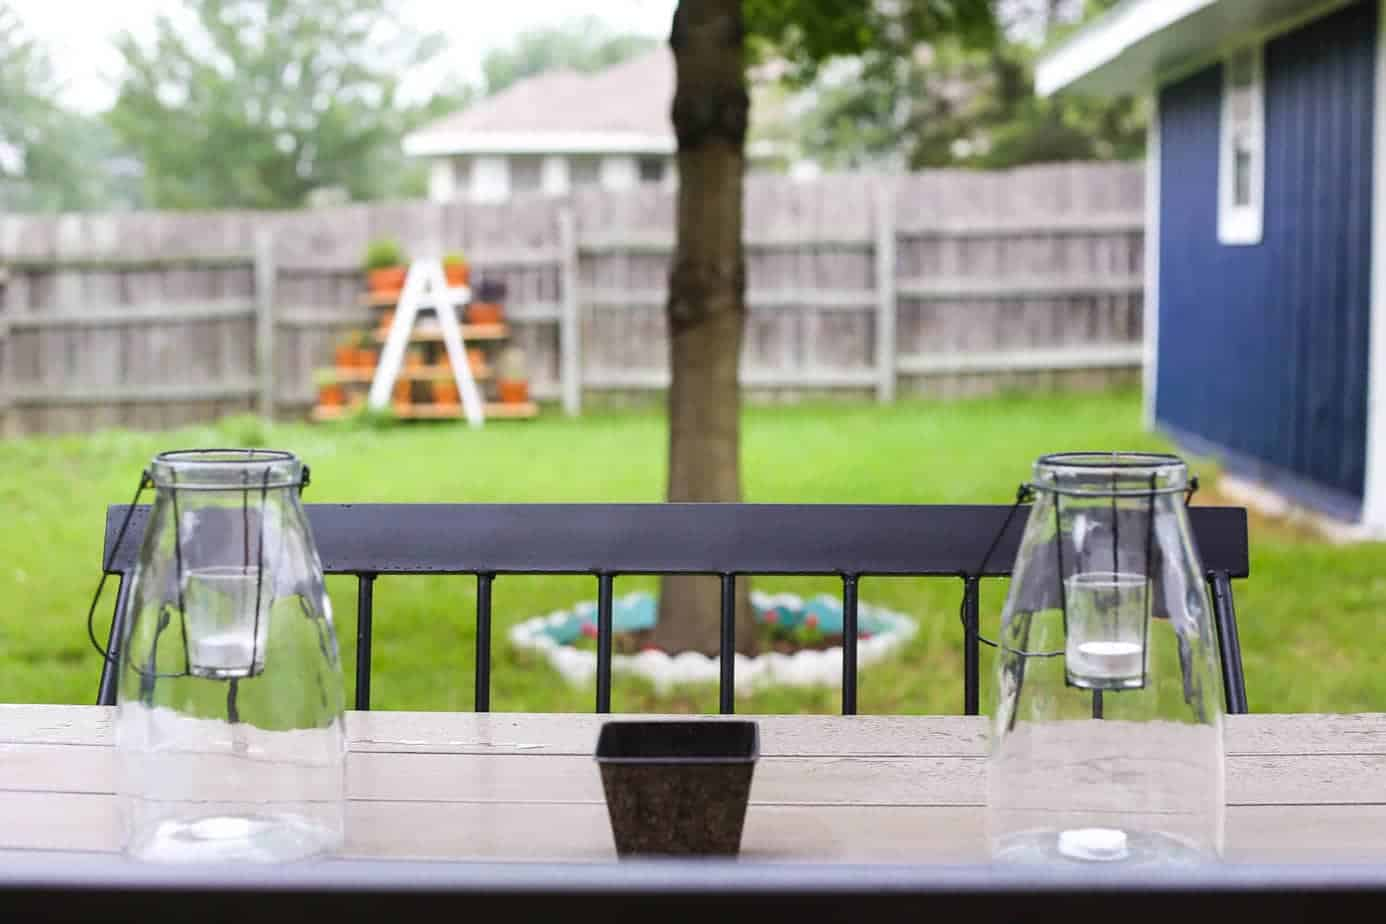 Outdoor Patio | Summer Patio Ideas | Patio Accessories | World Market Outdoor  Accessories | Entertaining